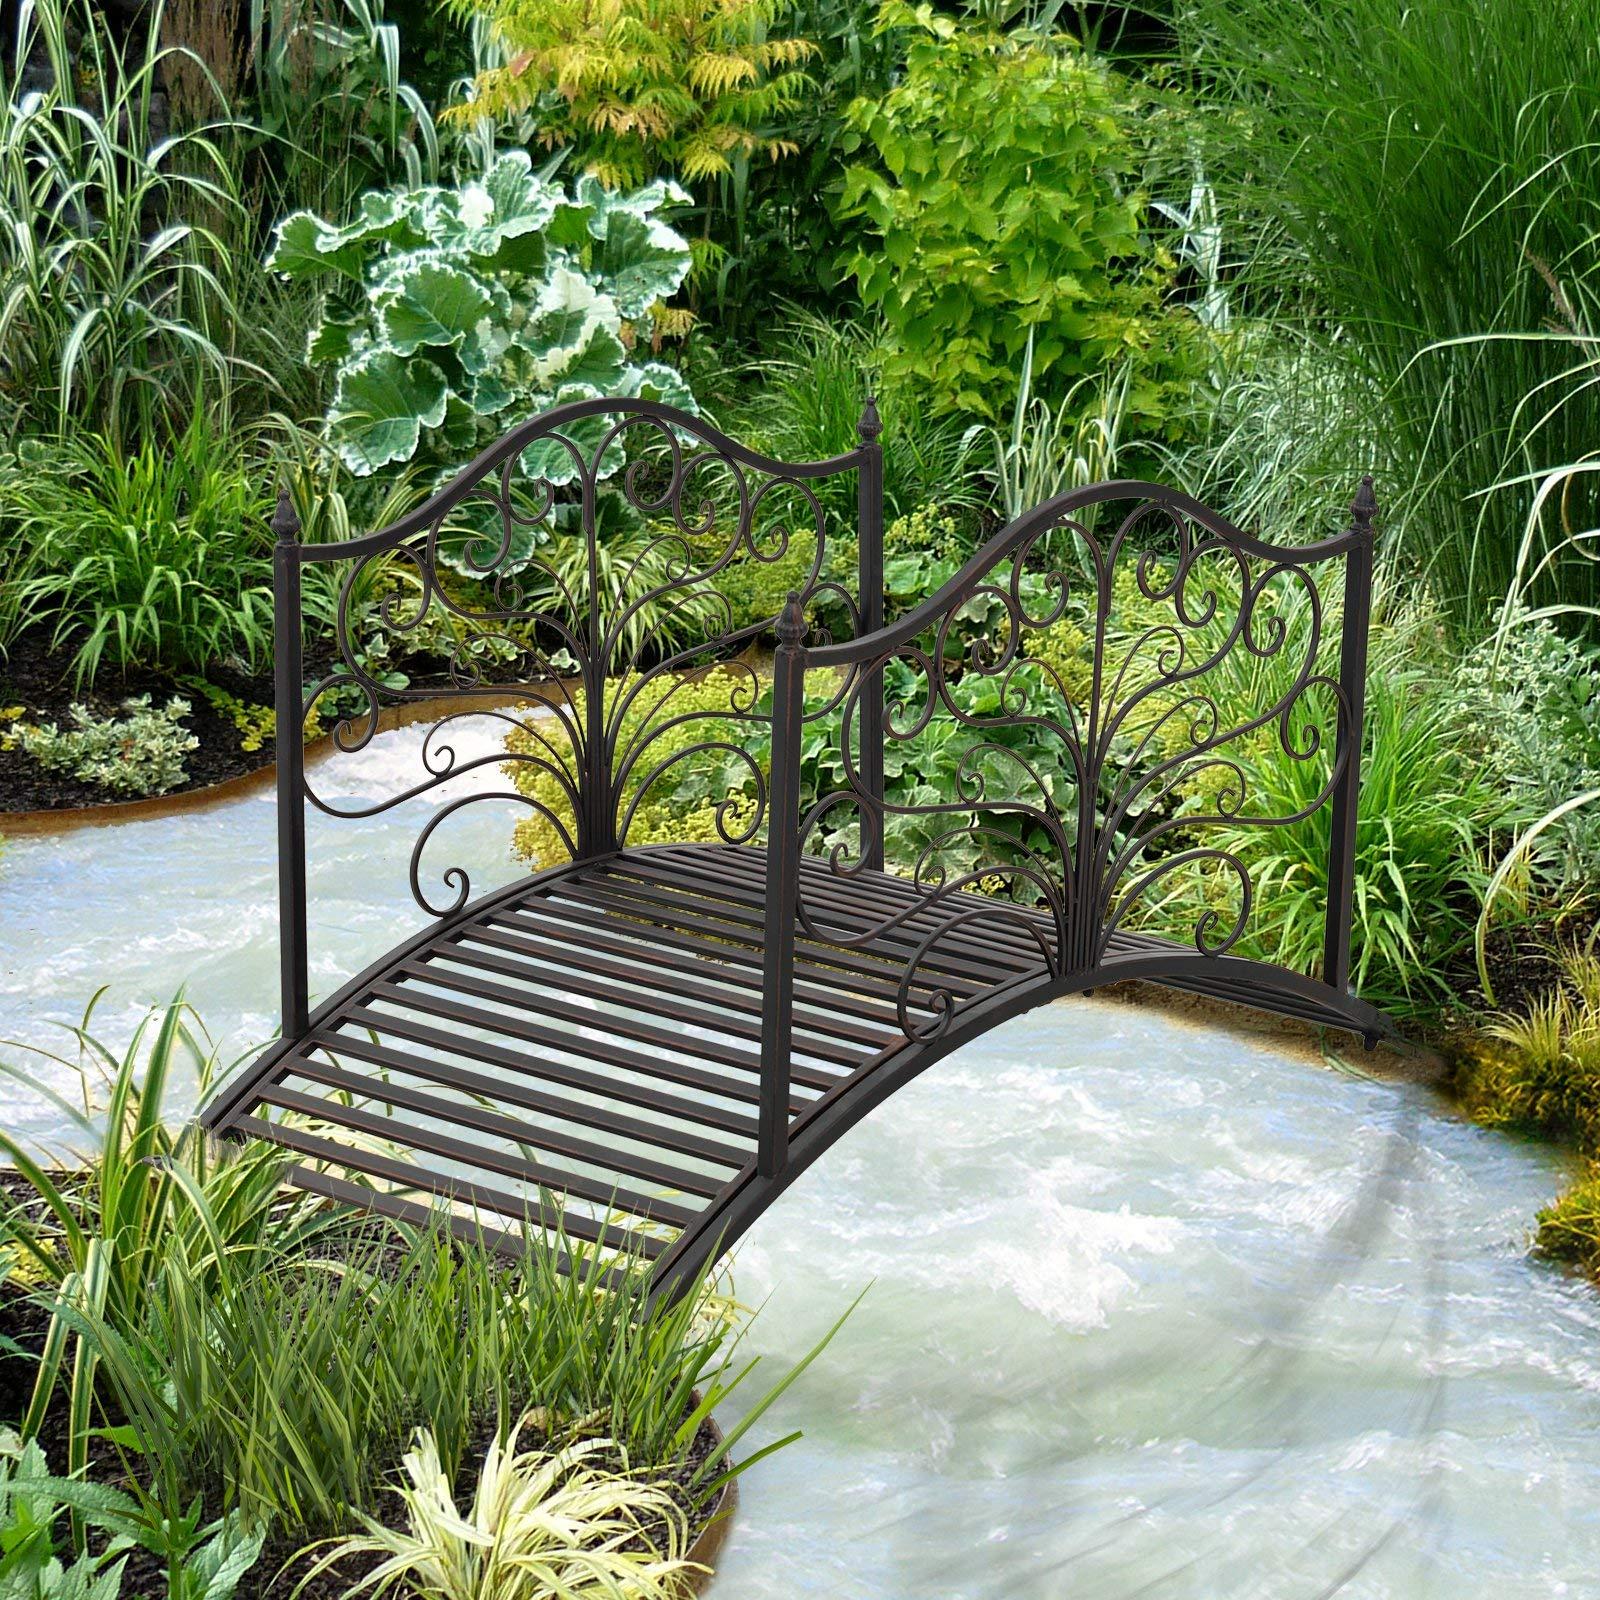 Festnight Outdoor Metal Garden Bridge Patio Backyard Decorative Bridge Black Bronze, 4' by Festnight (Image #1)